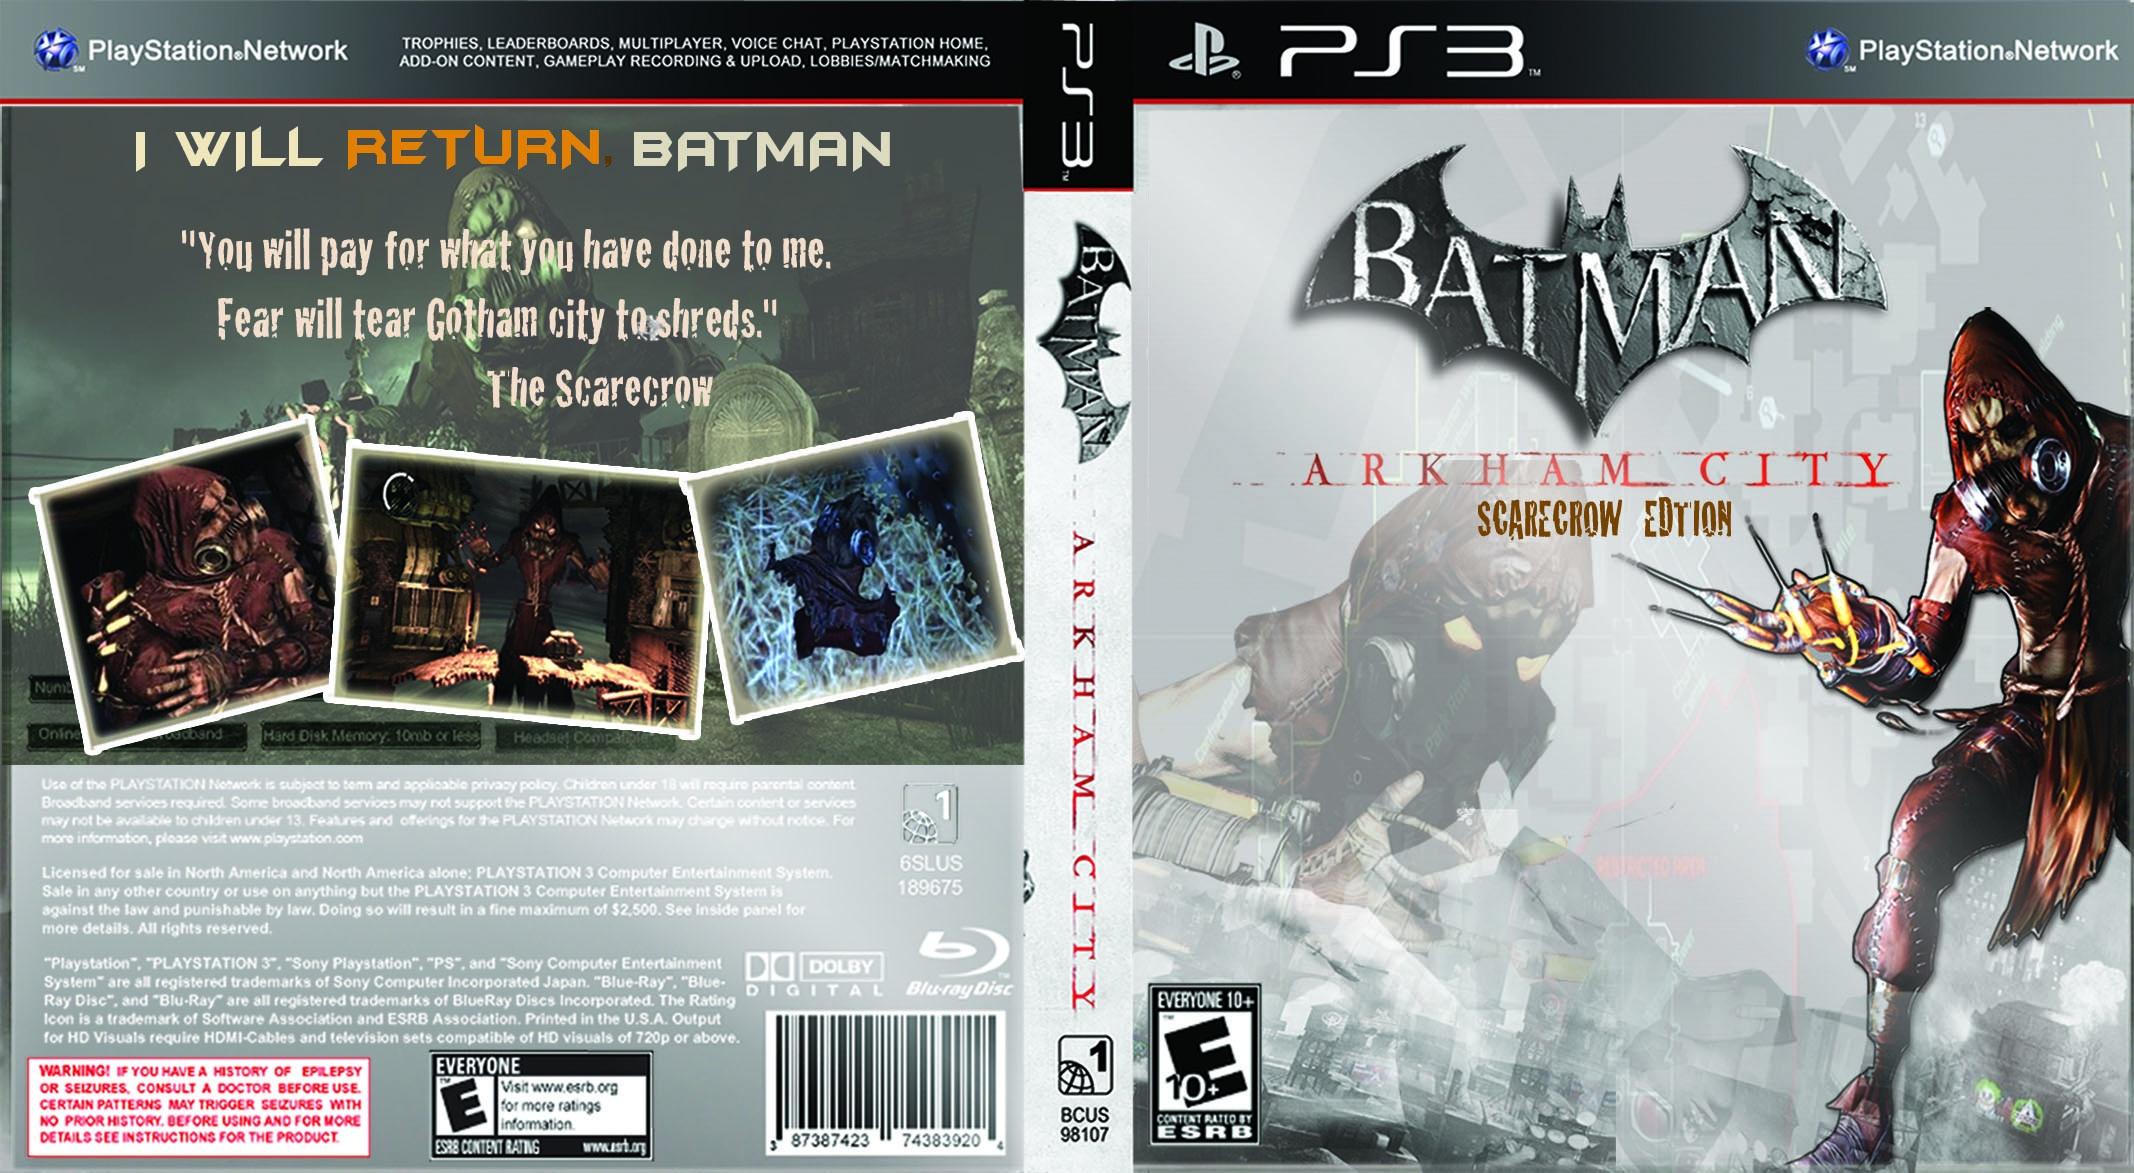 batman arkham city scarecrow edition playstation 3 box art cover by